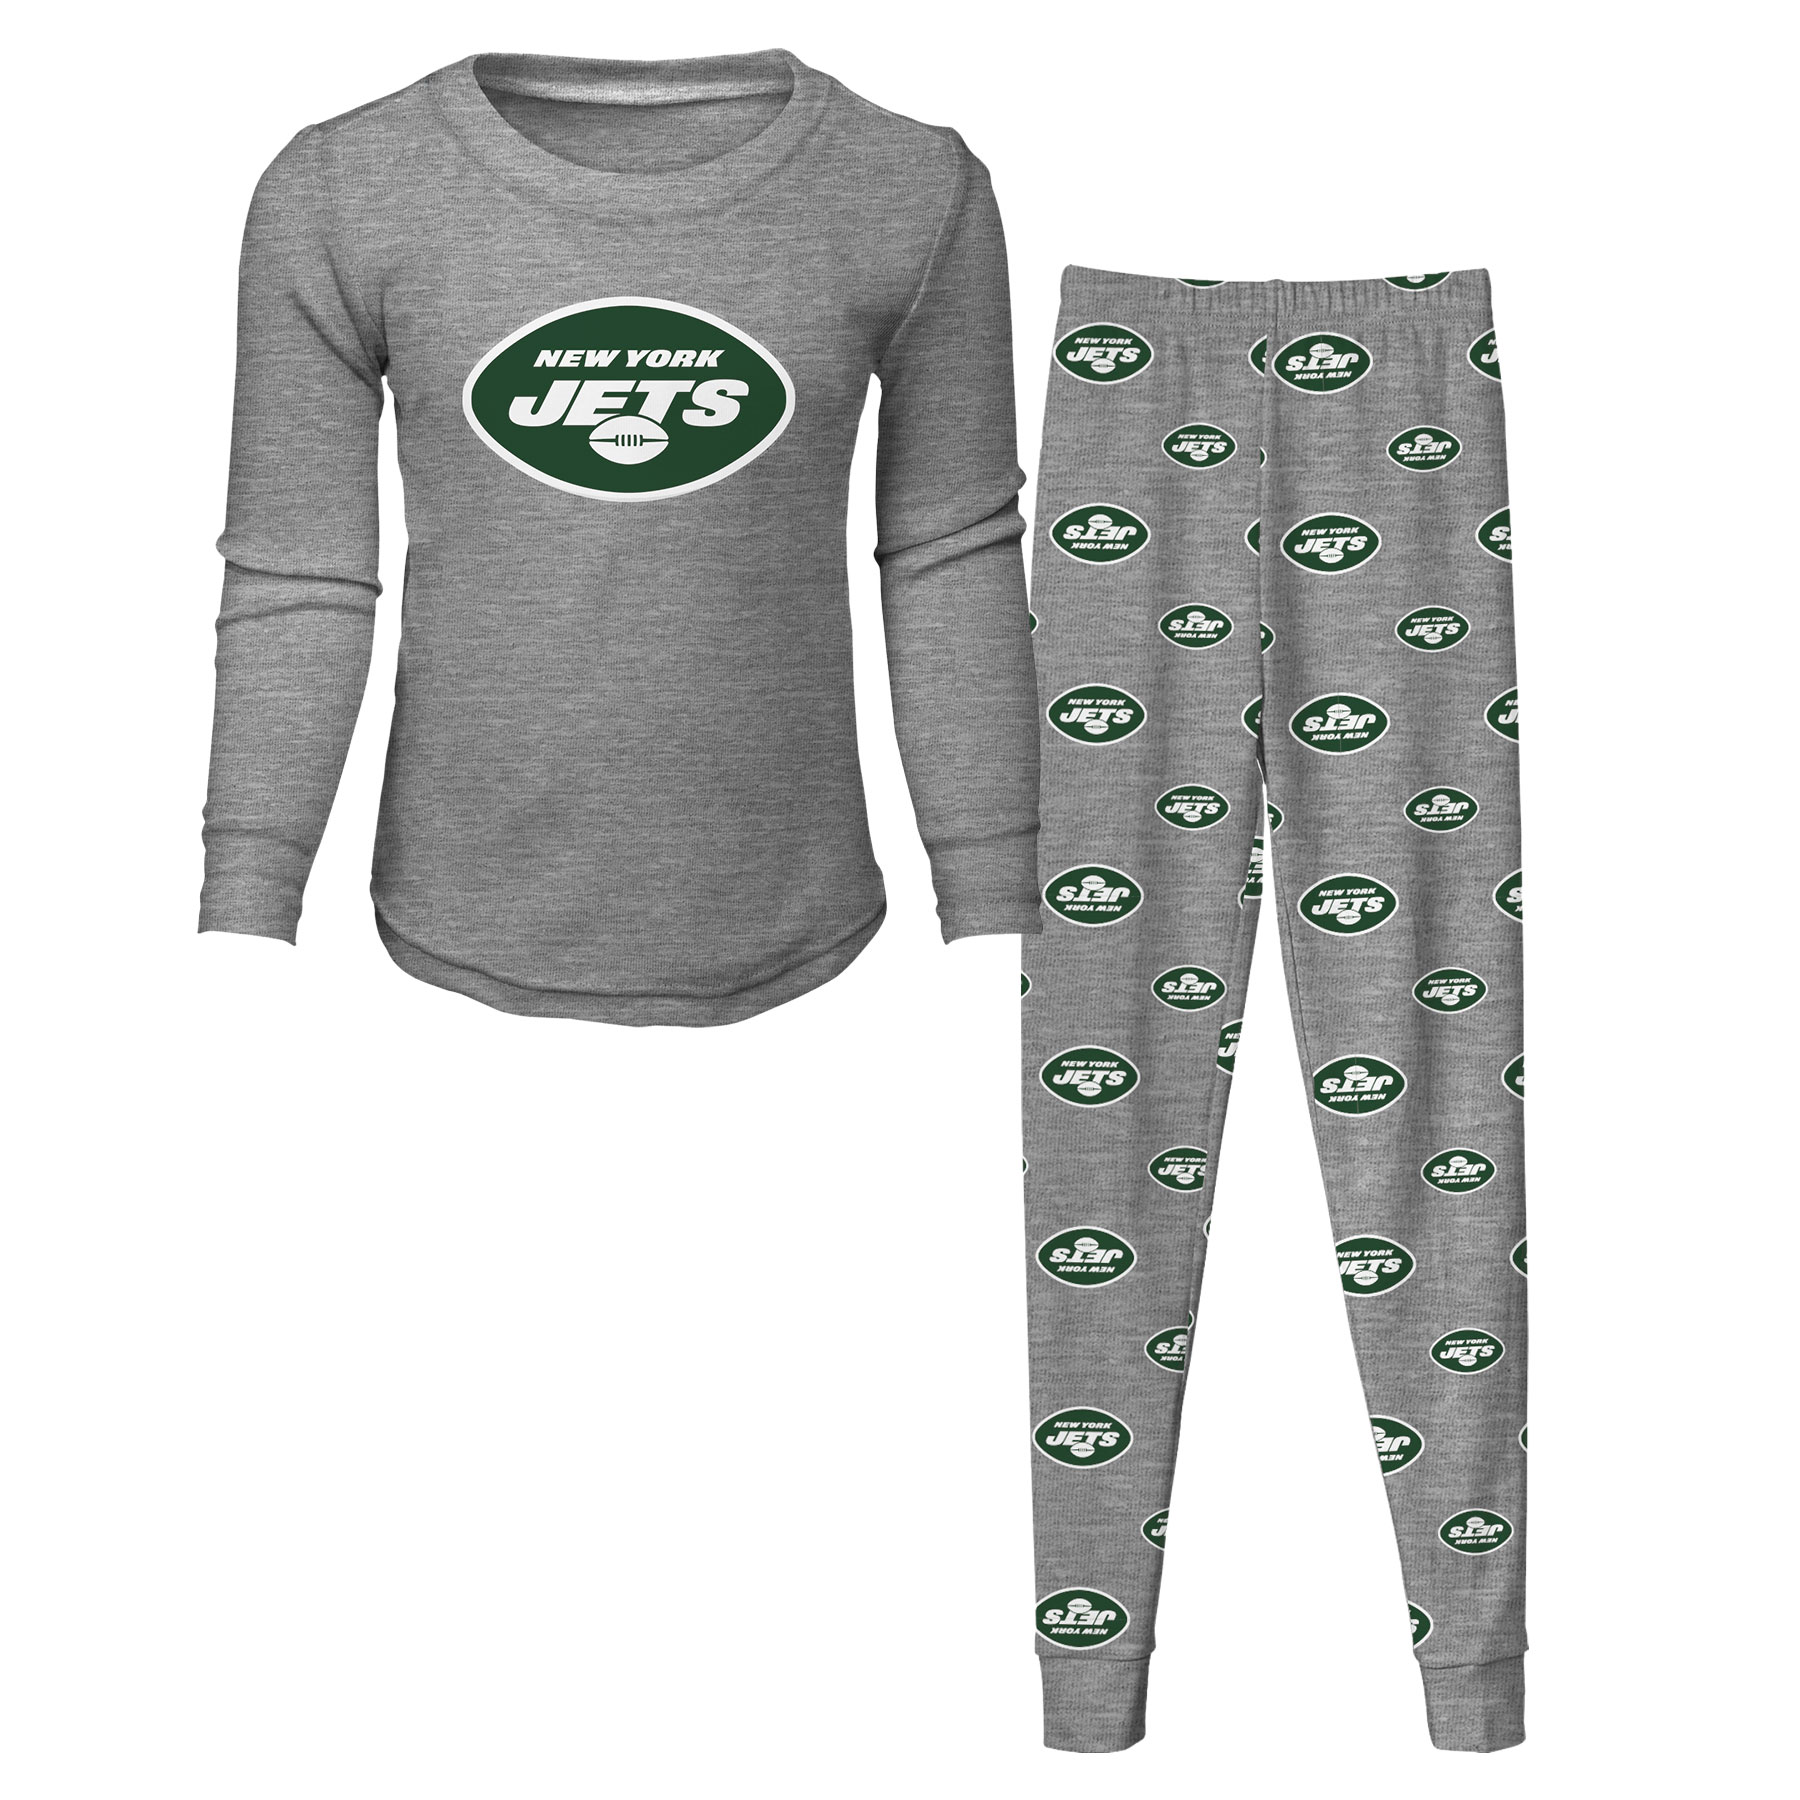 Washington Redskins OuterStuff NFL Newborn Team Color Shirt and Pant Set